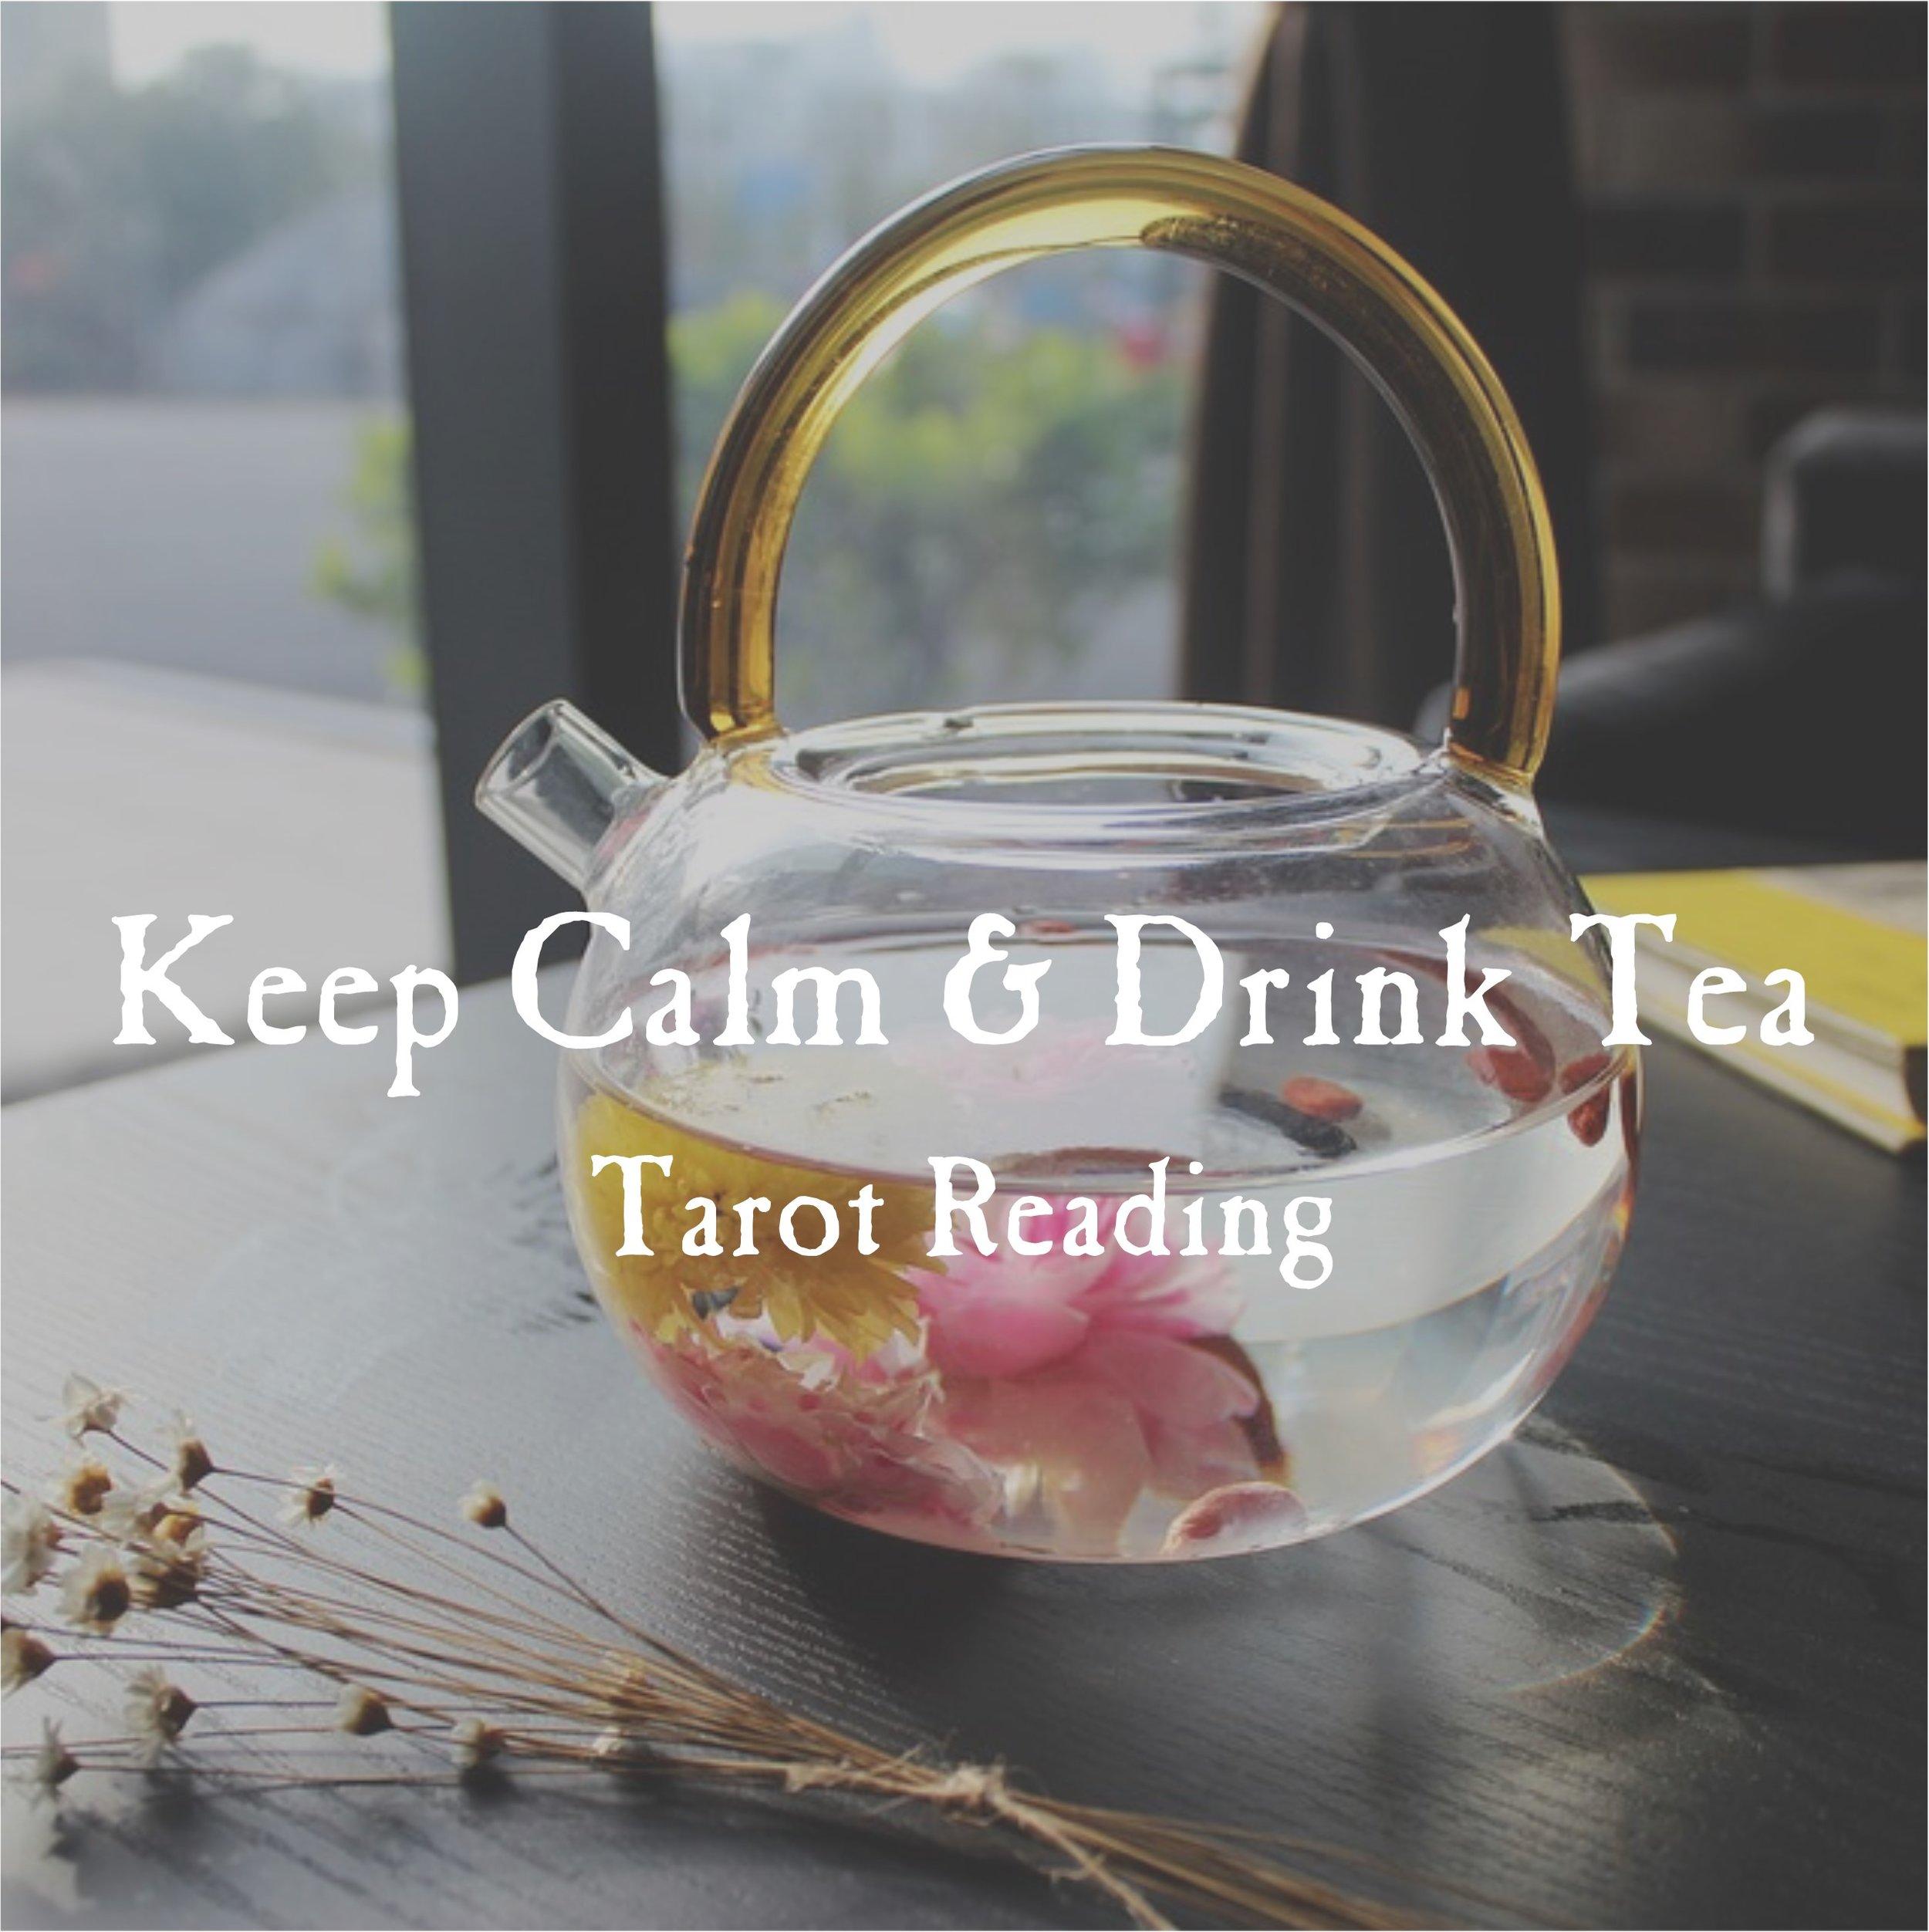 keep calm anddrink tea.jpg